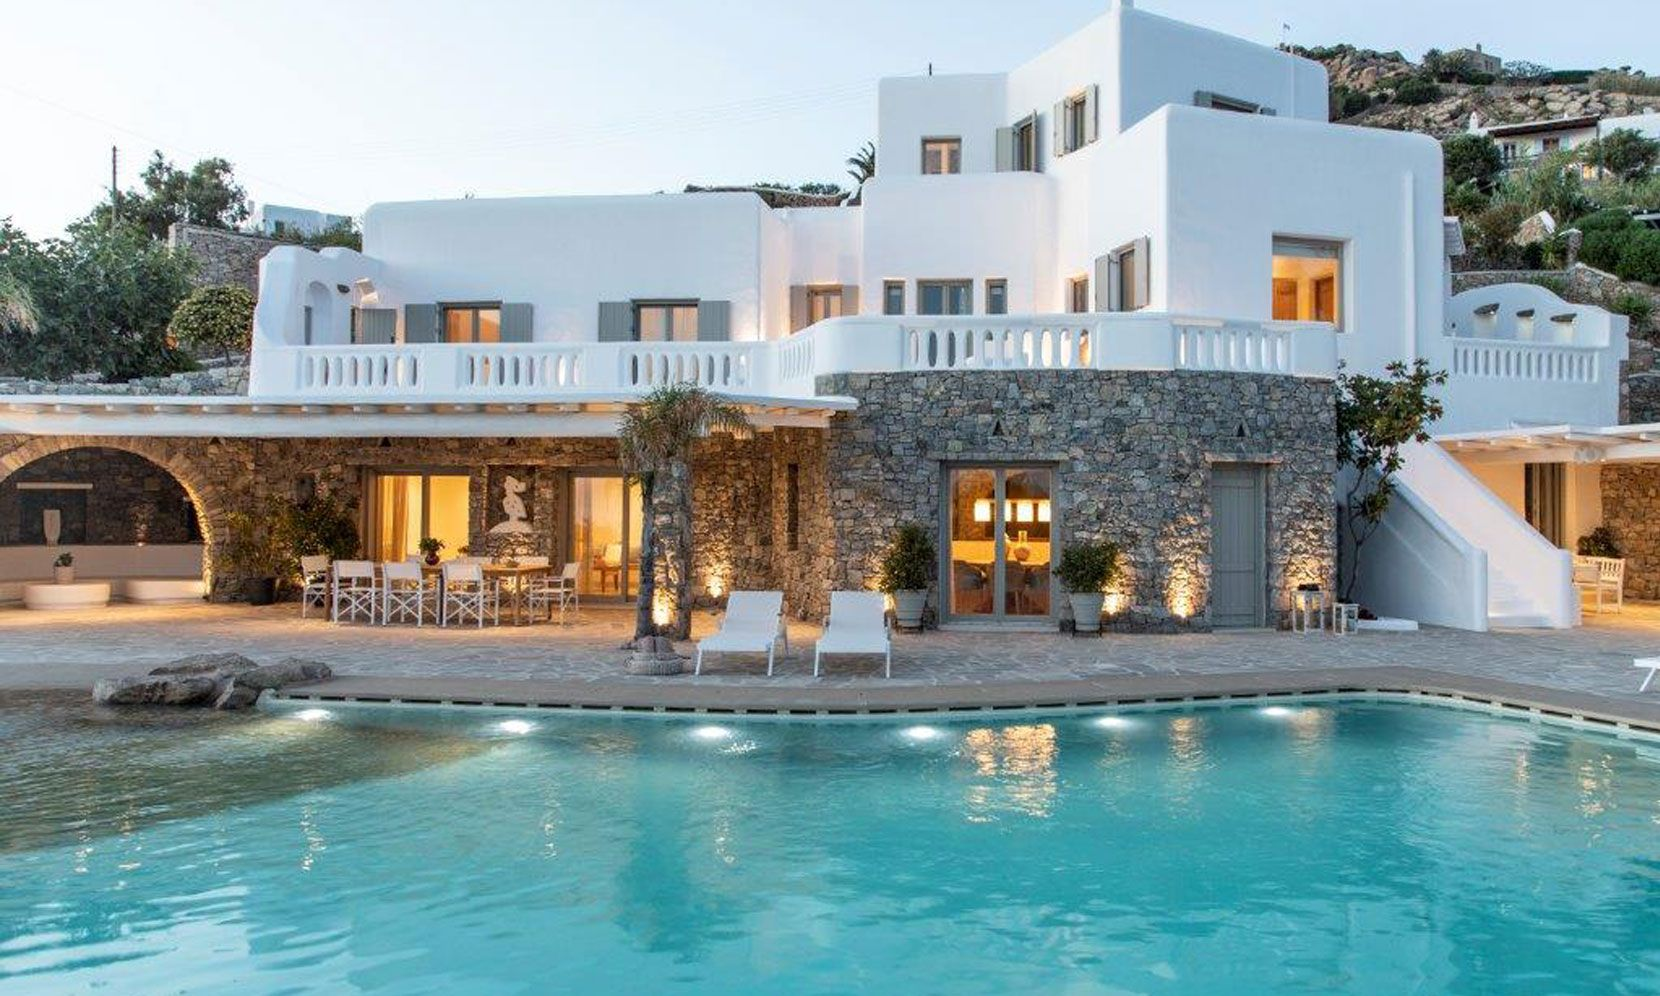 Mykonos Villa Ester jumbotron image